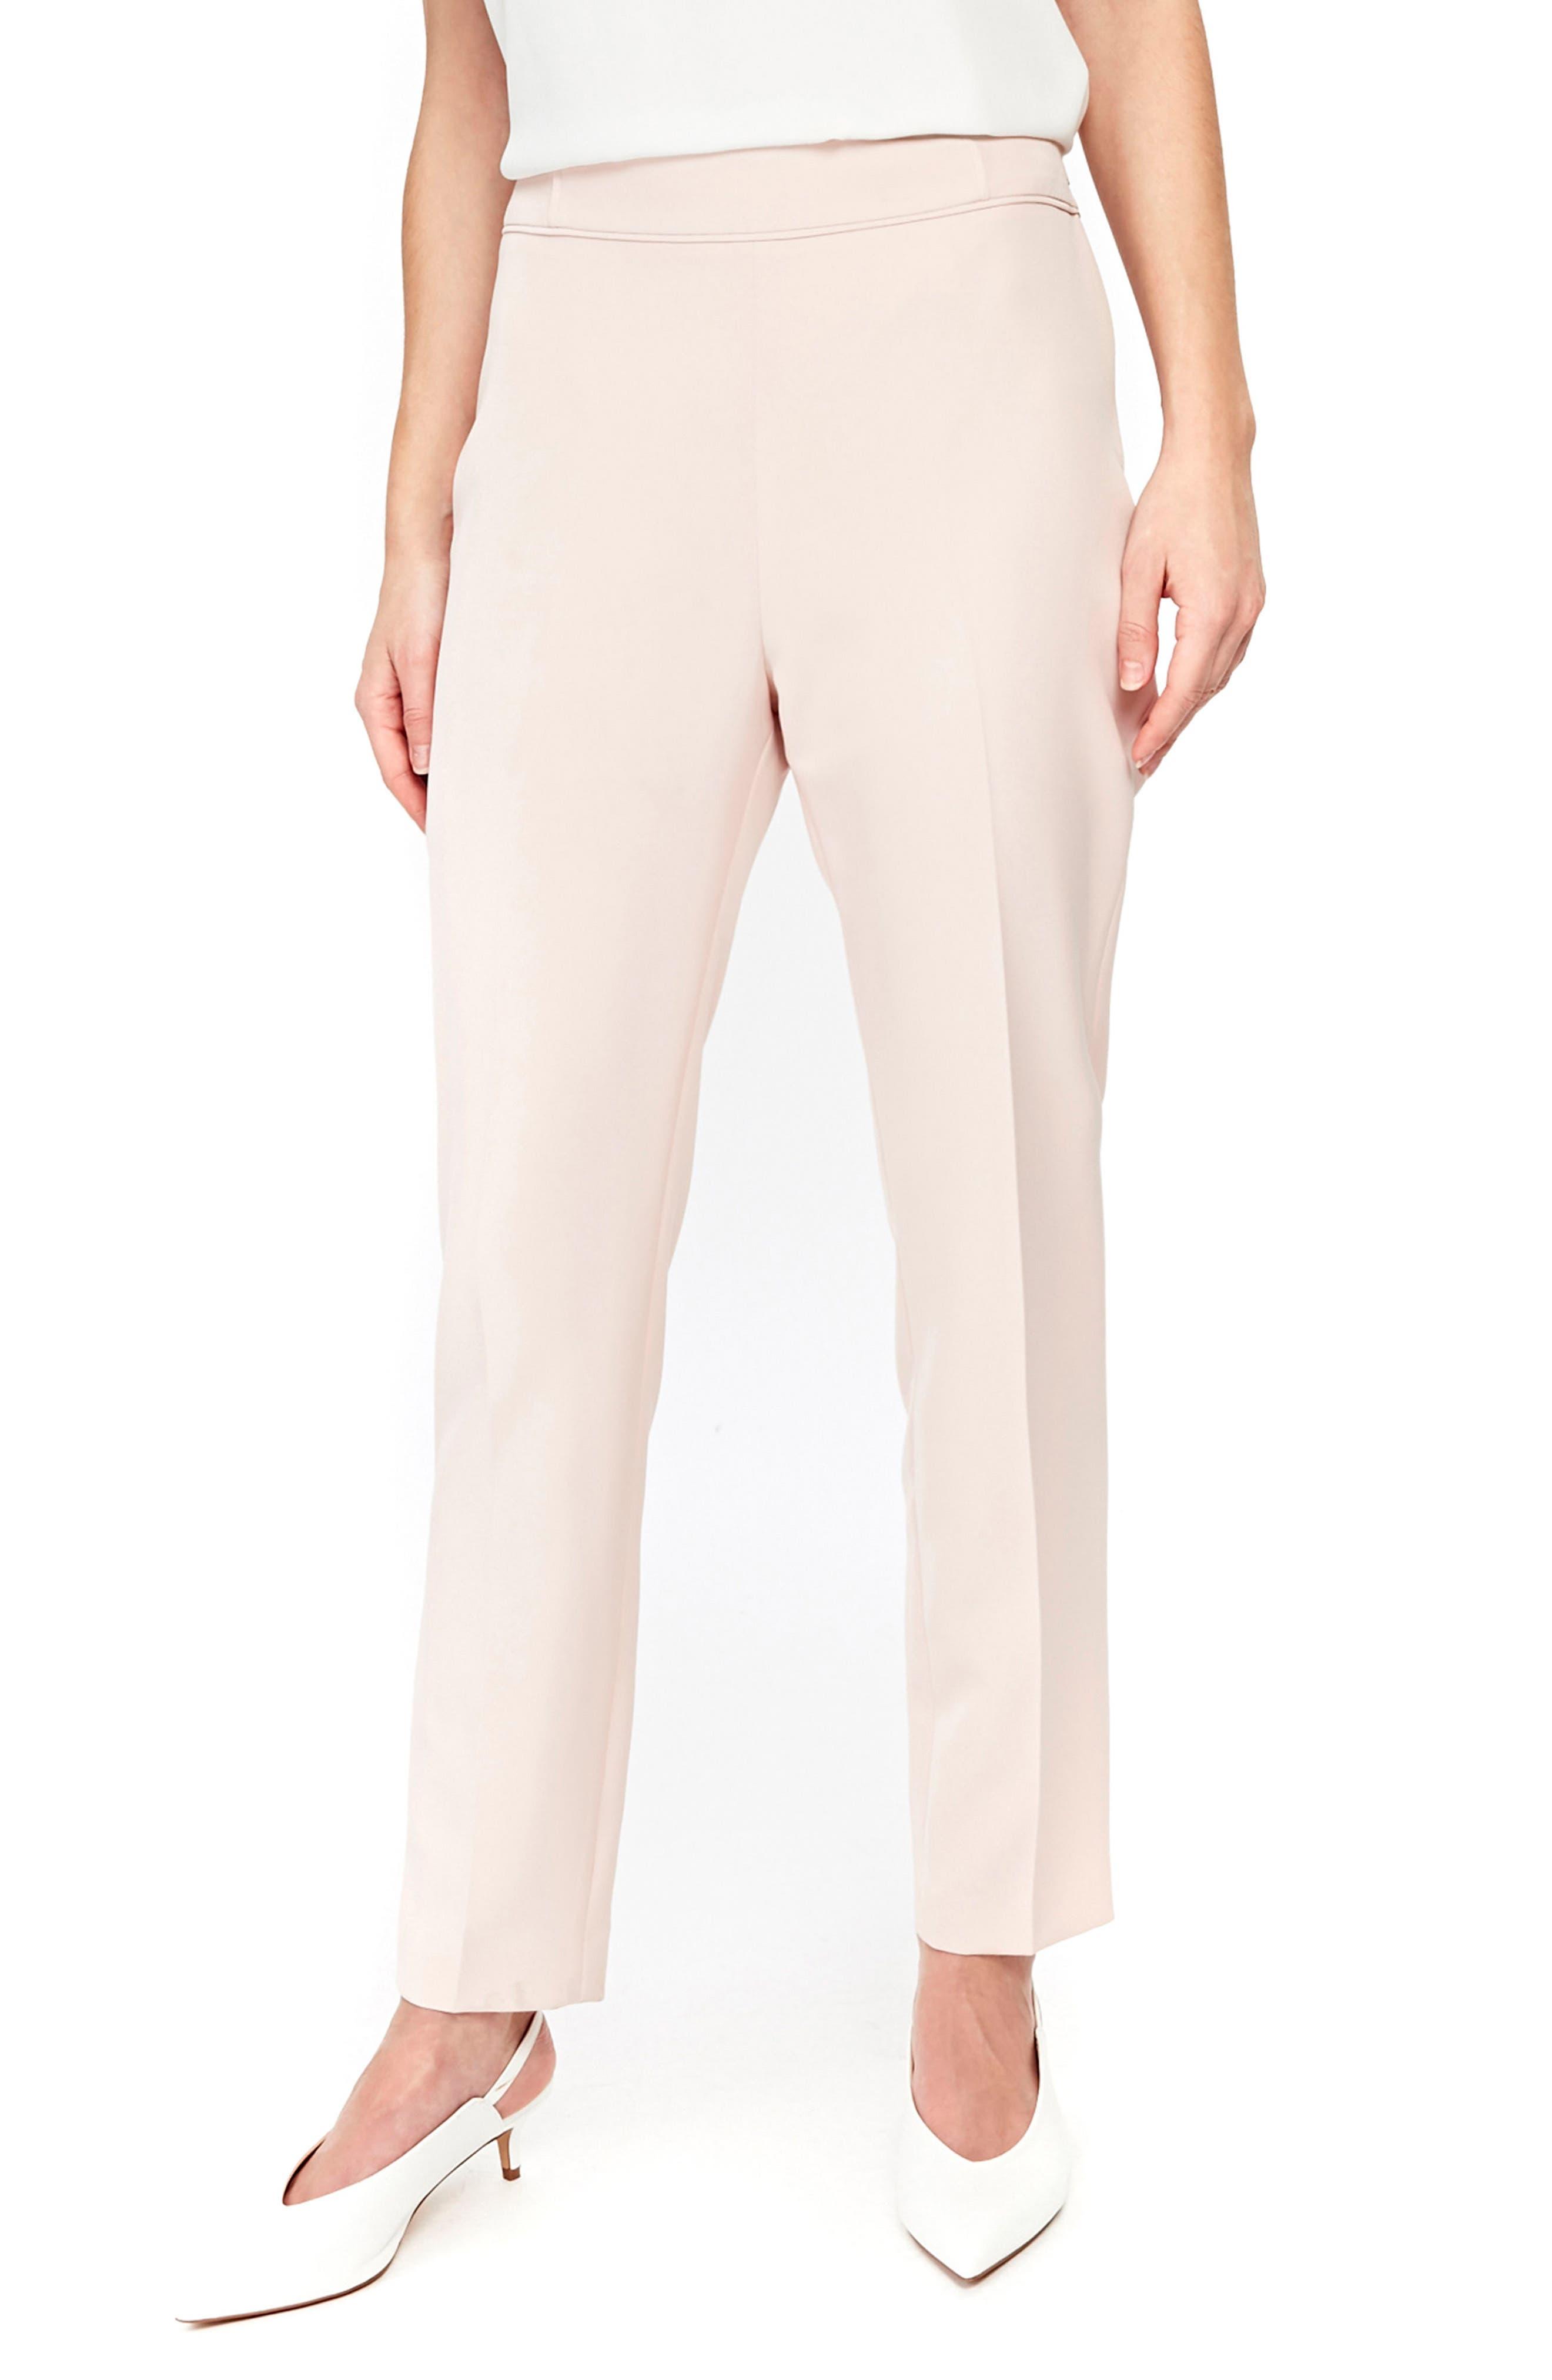 Sienna Trousers,                             Main thumbnail 1, color,                             Blush